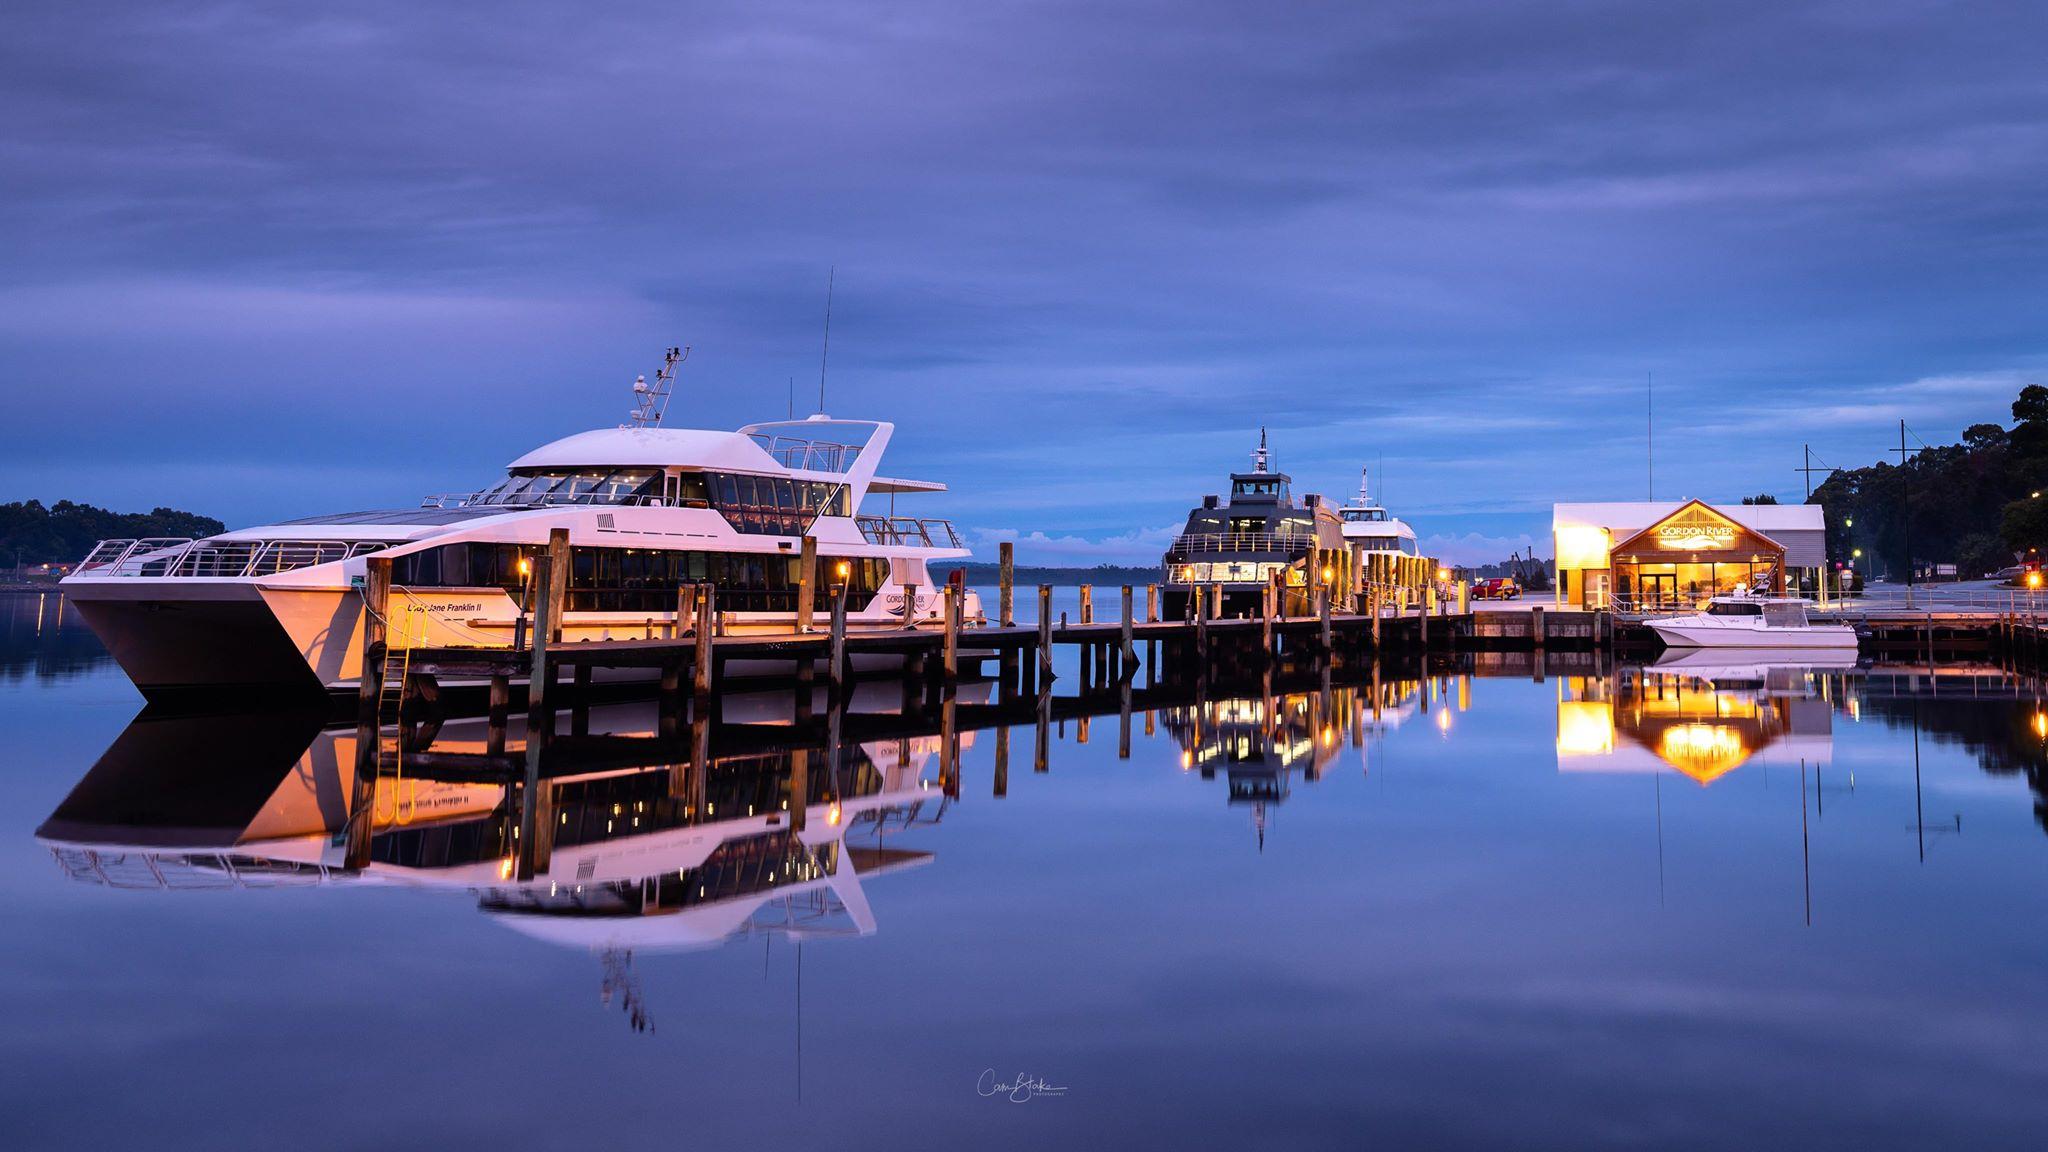 Strahan docks